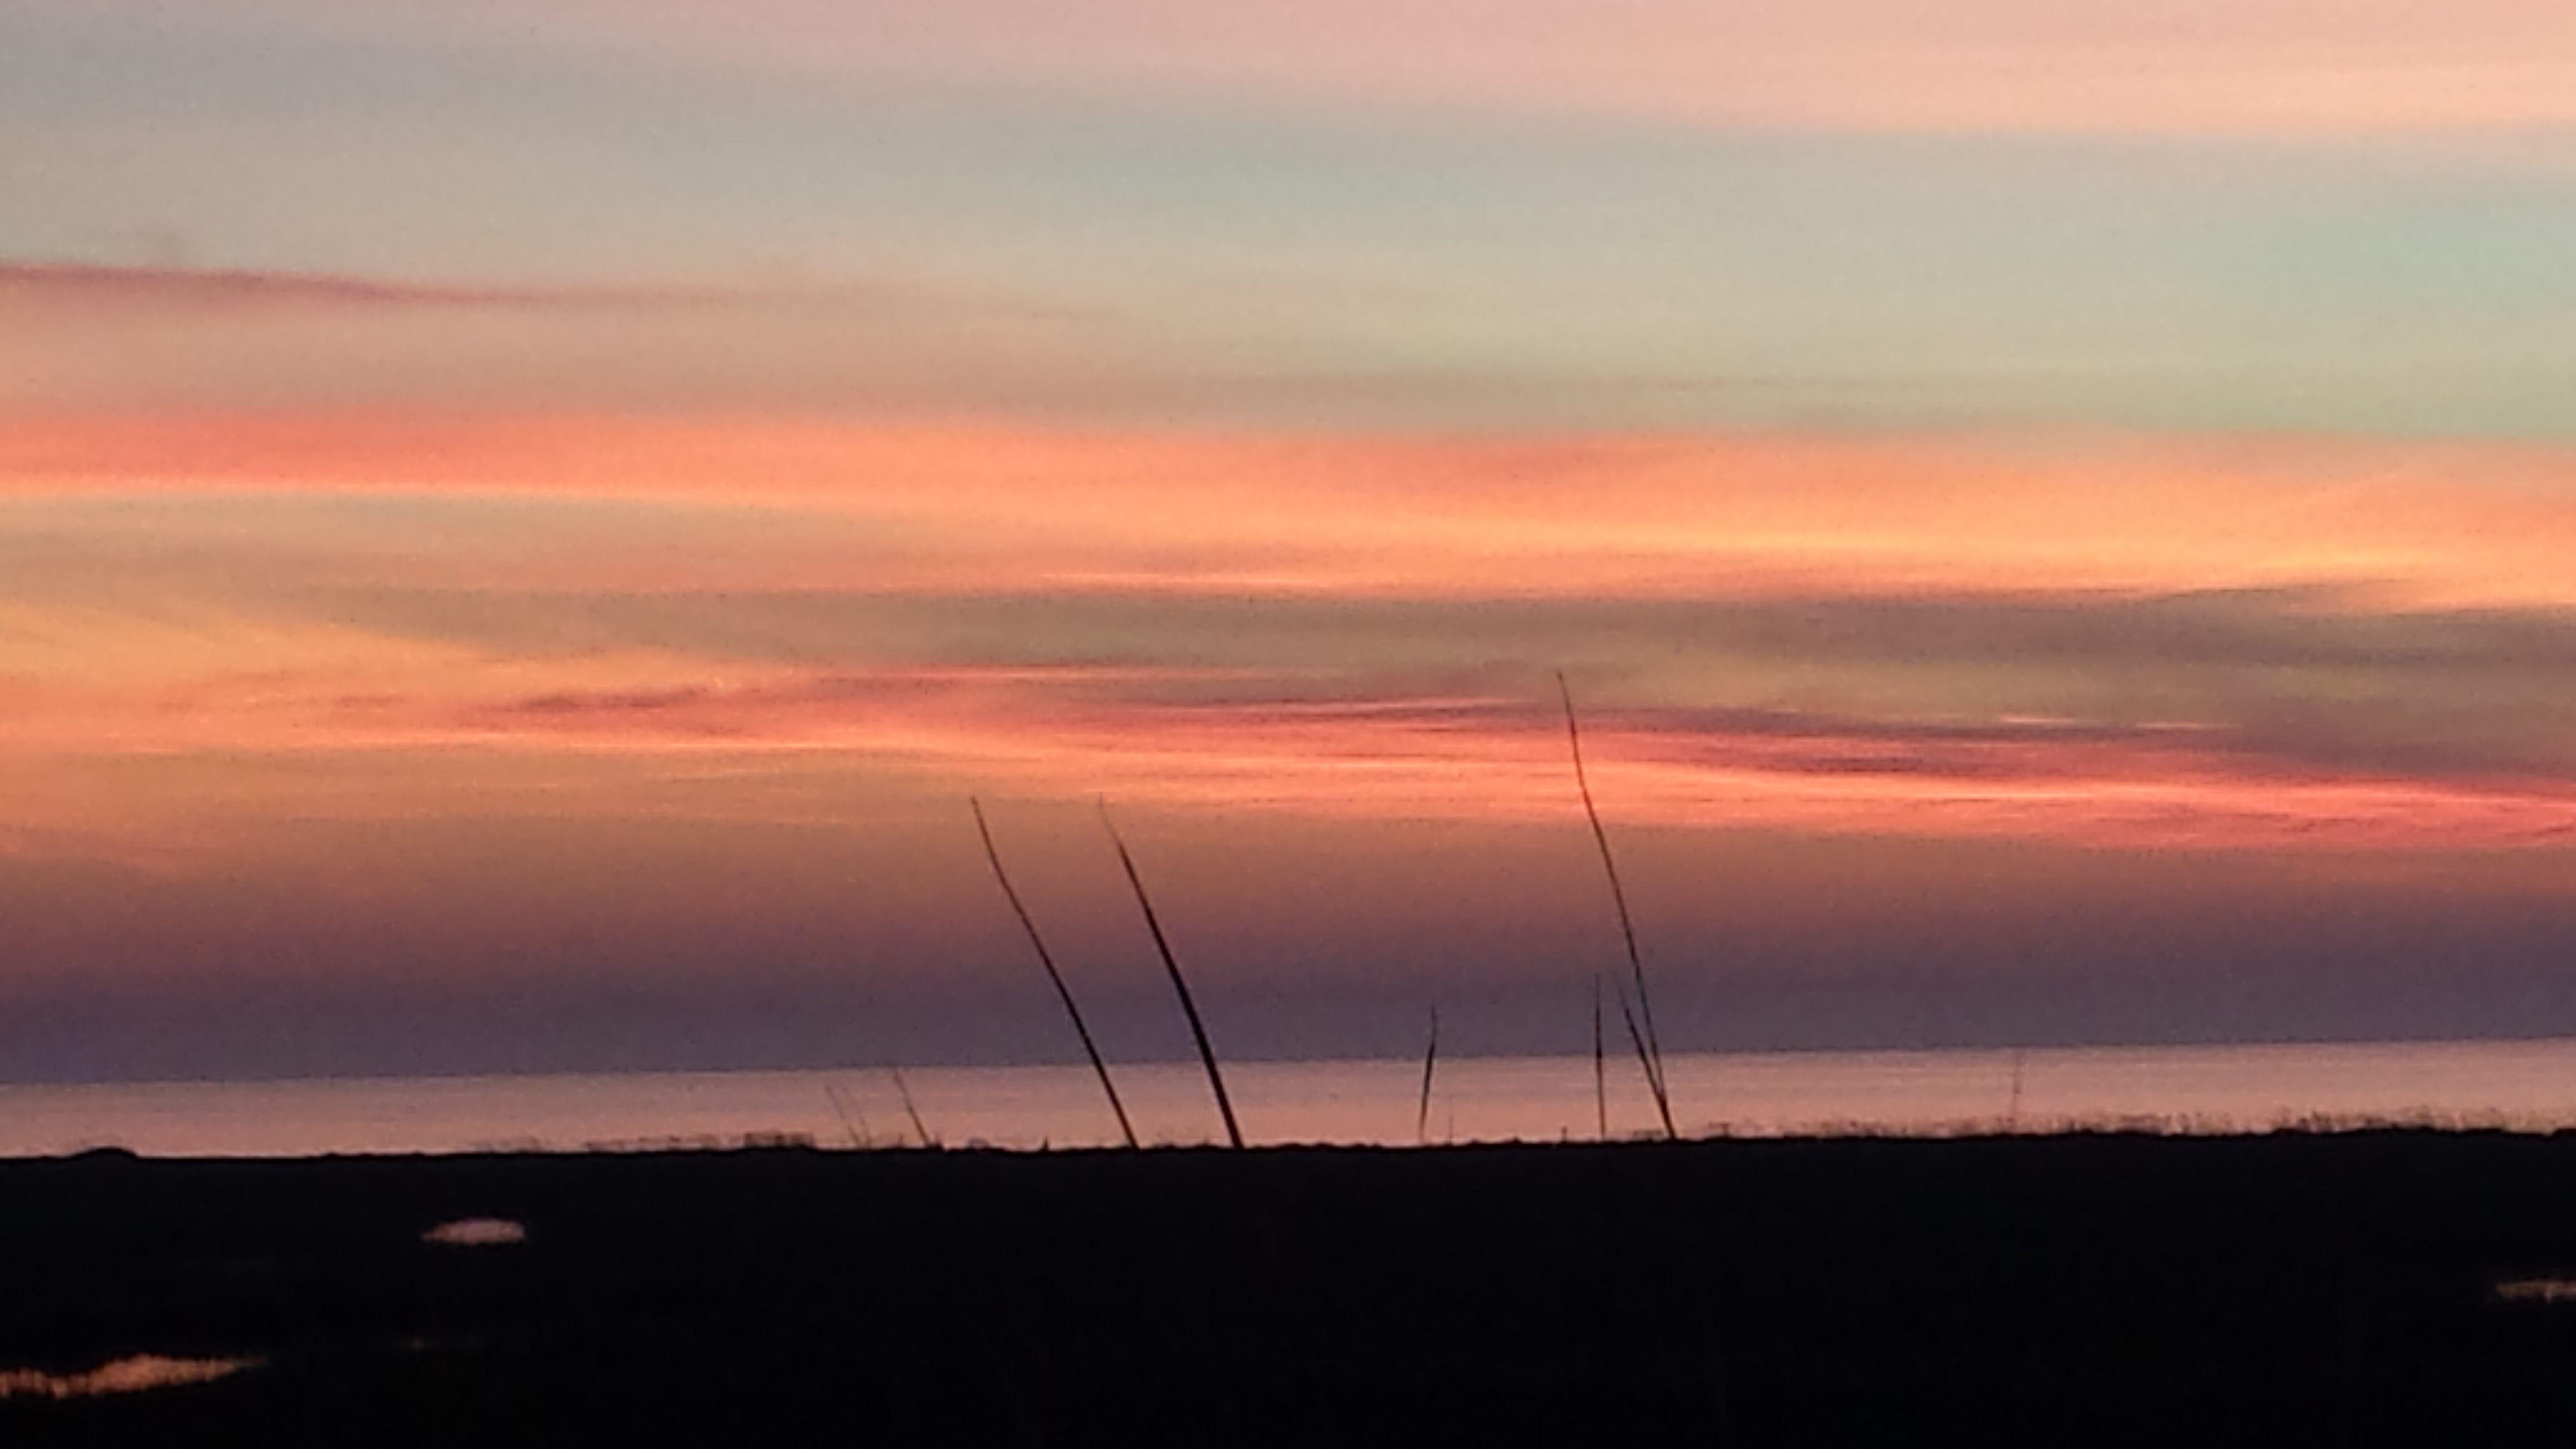 Sunrise at Edisto